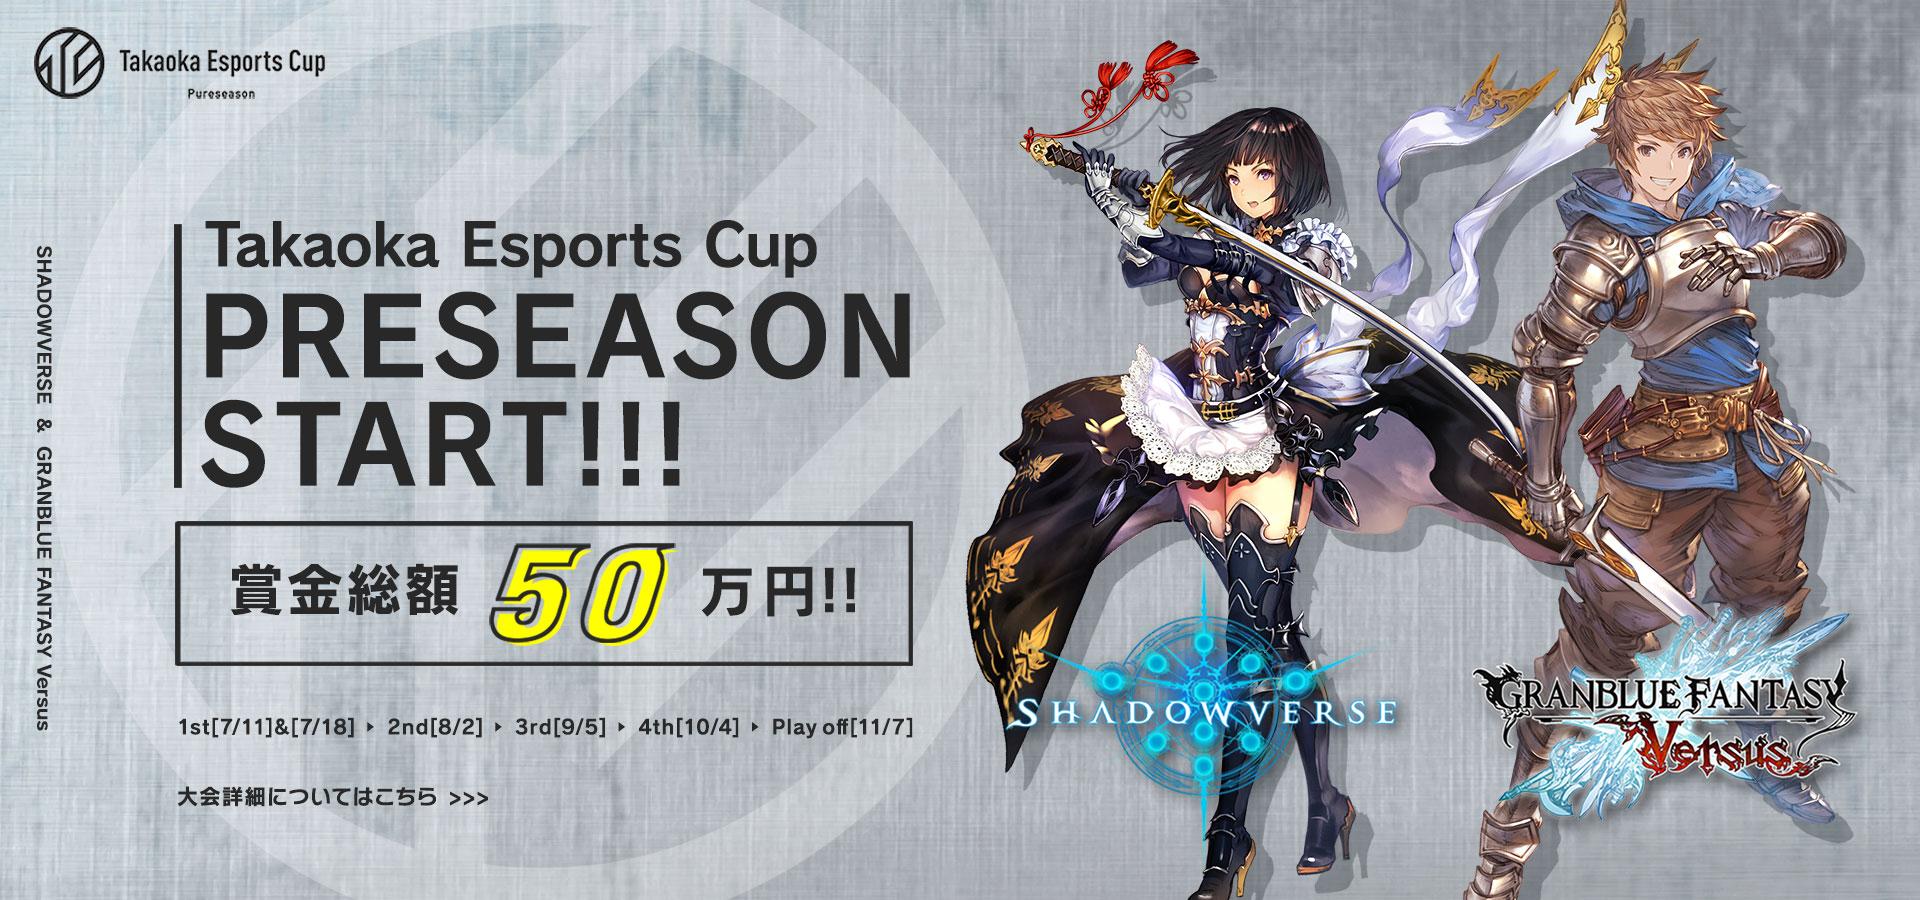 Takaoka Esports Cuo Pureseason